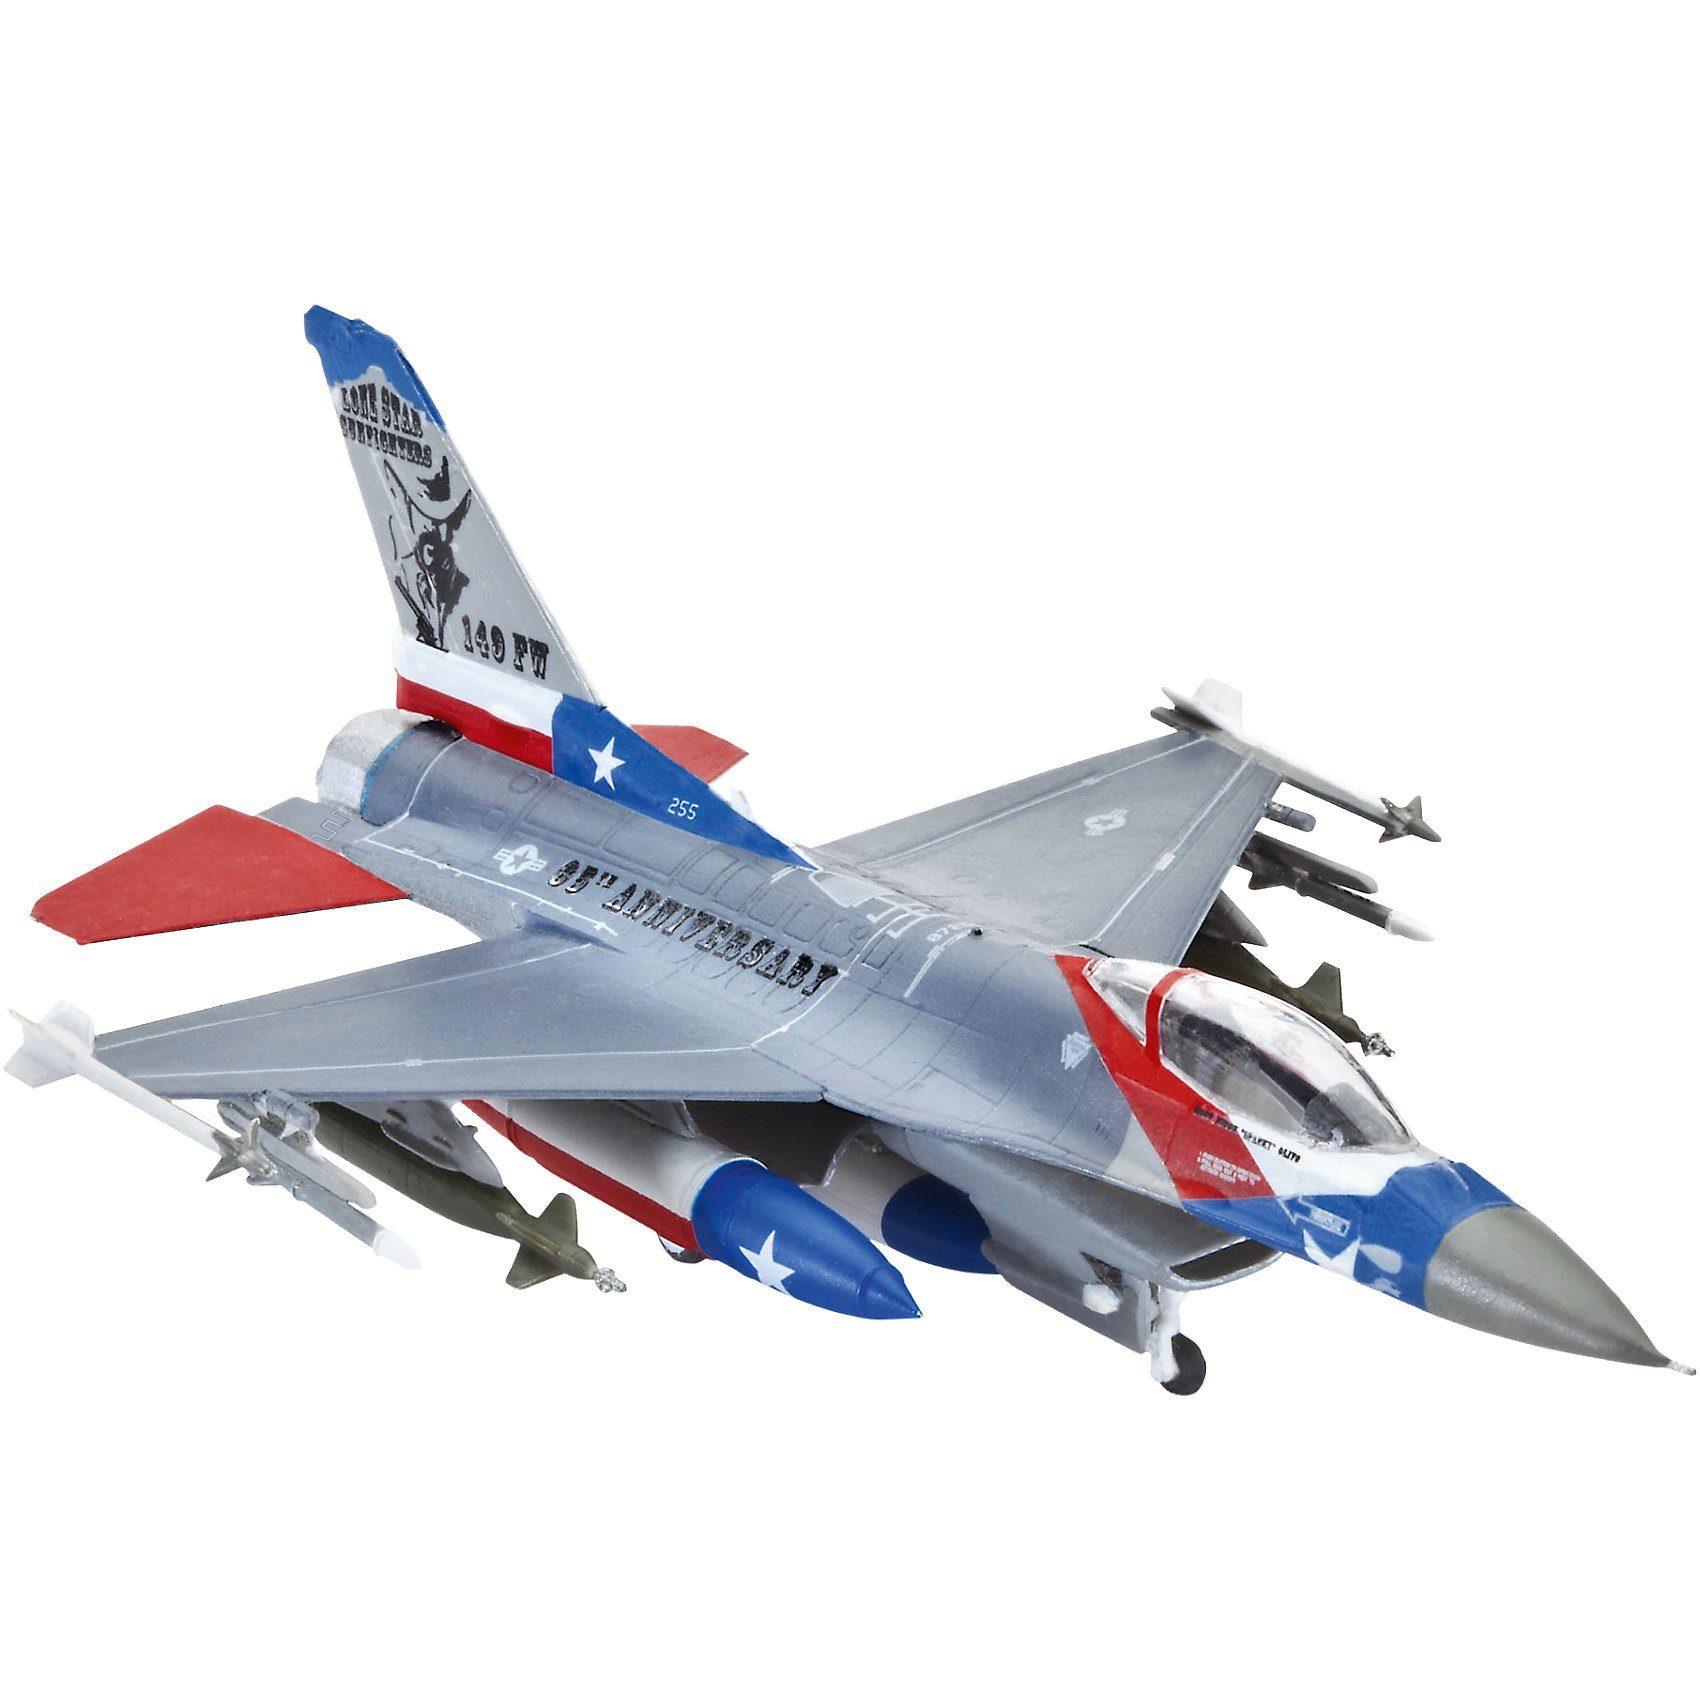 Revell Modellbausatz F-16C Fighting Falcon im Maßstab 1:144